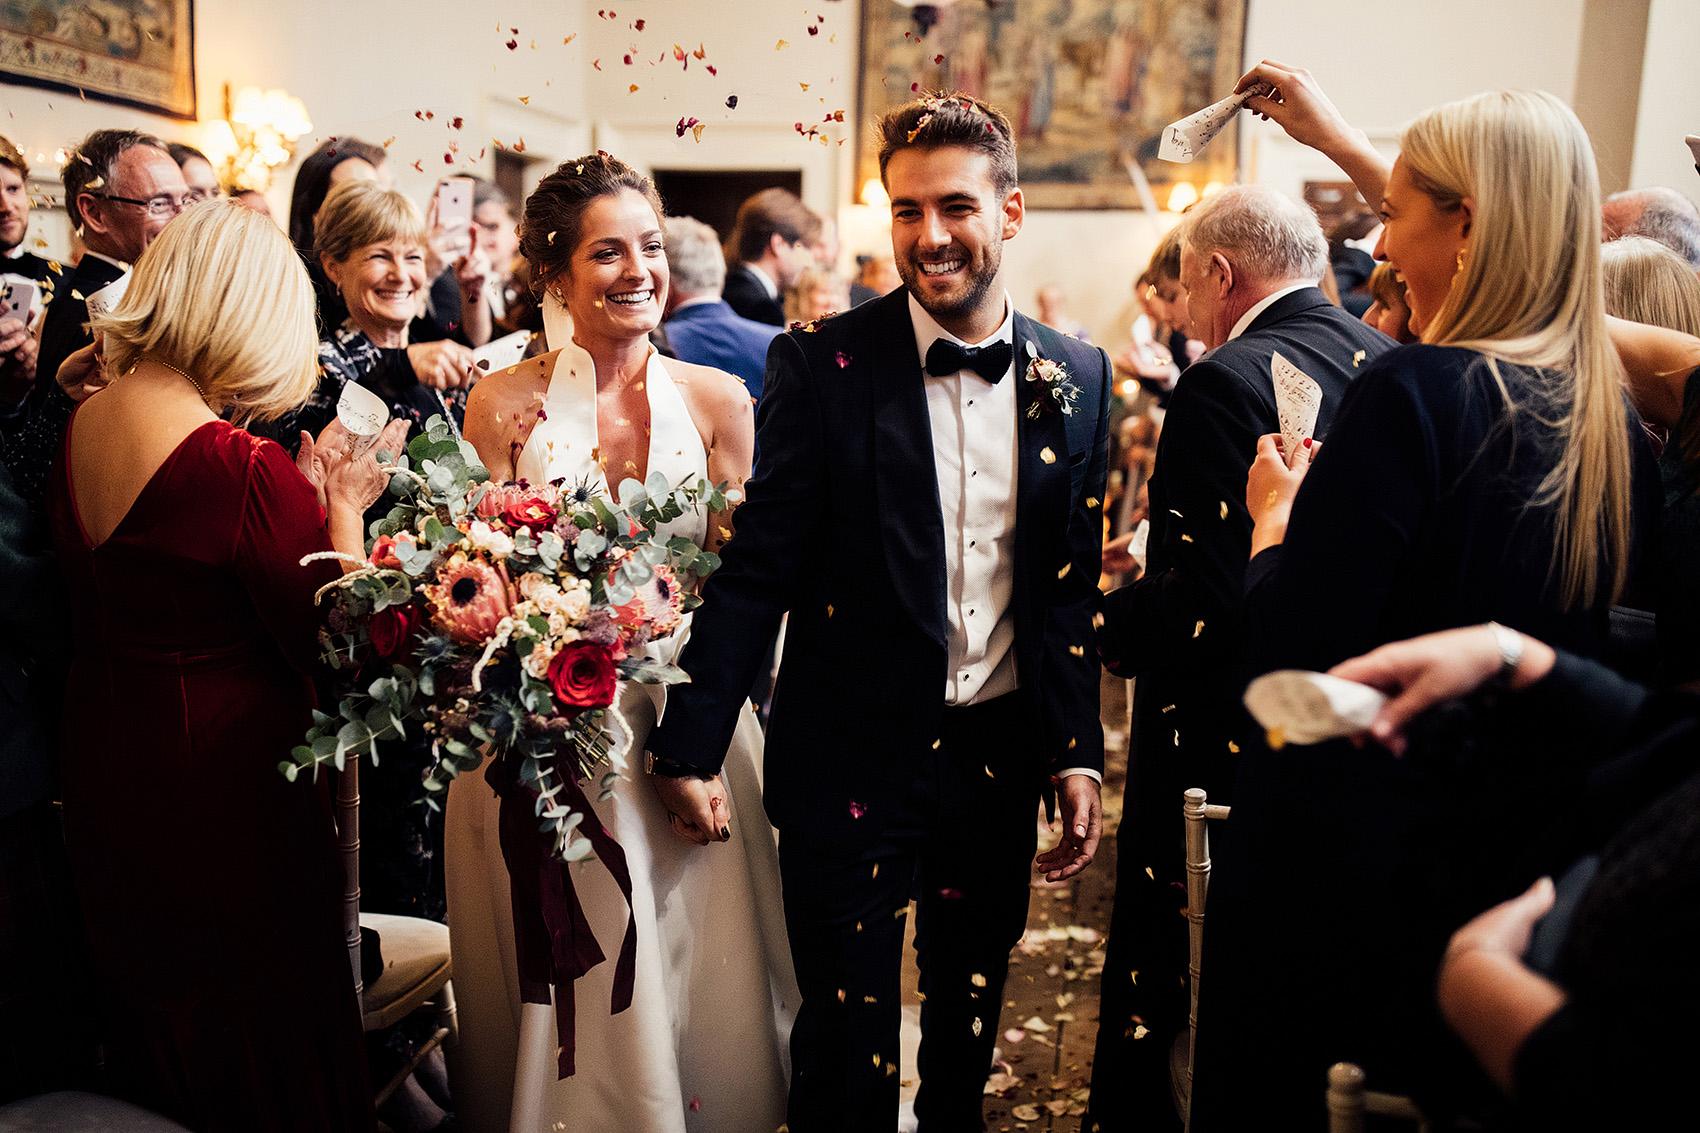 elmore-court-wedding-photography-39.jpg